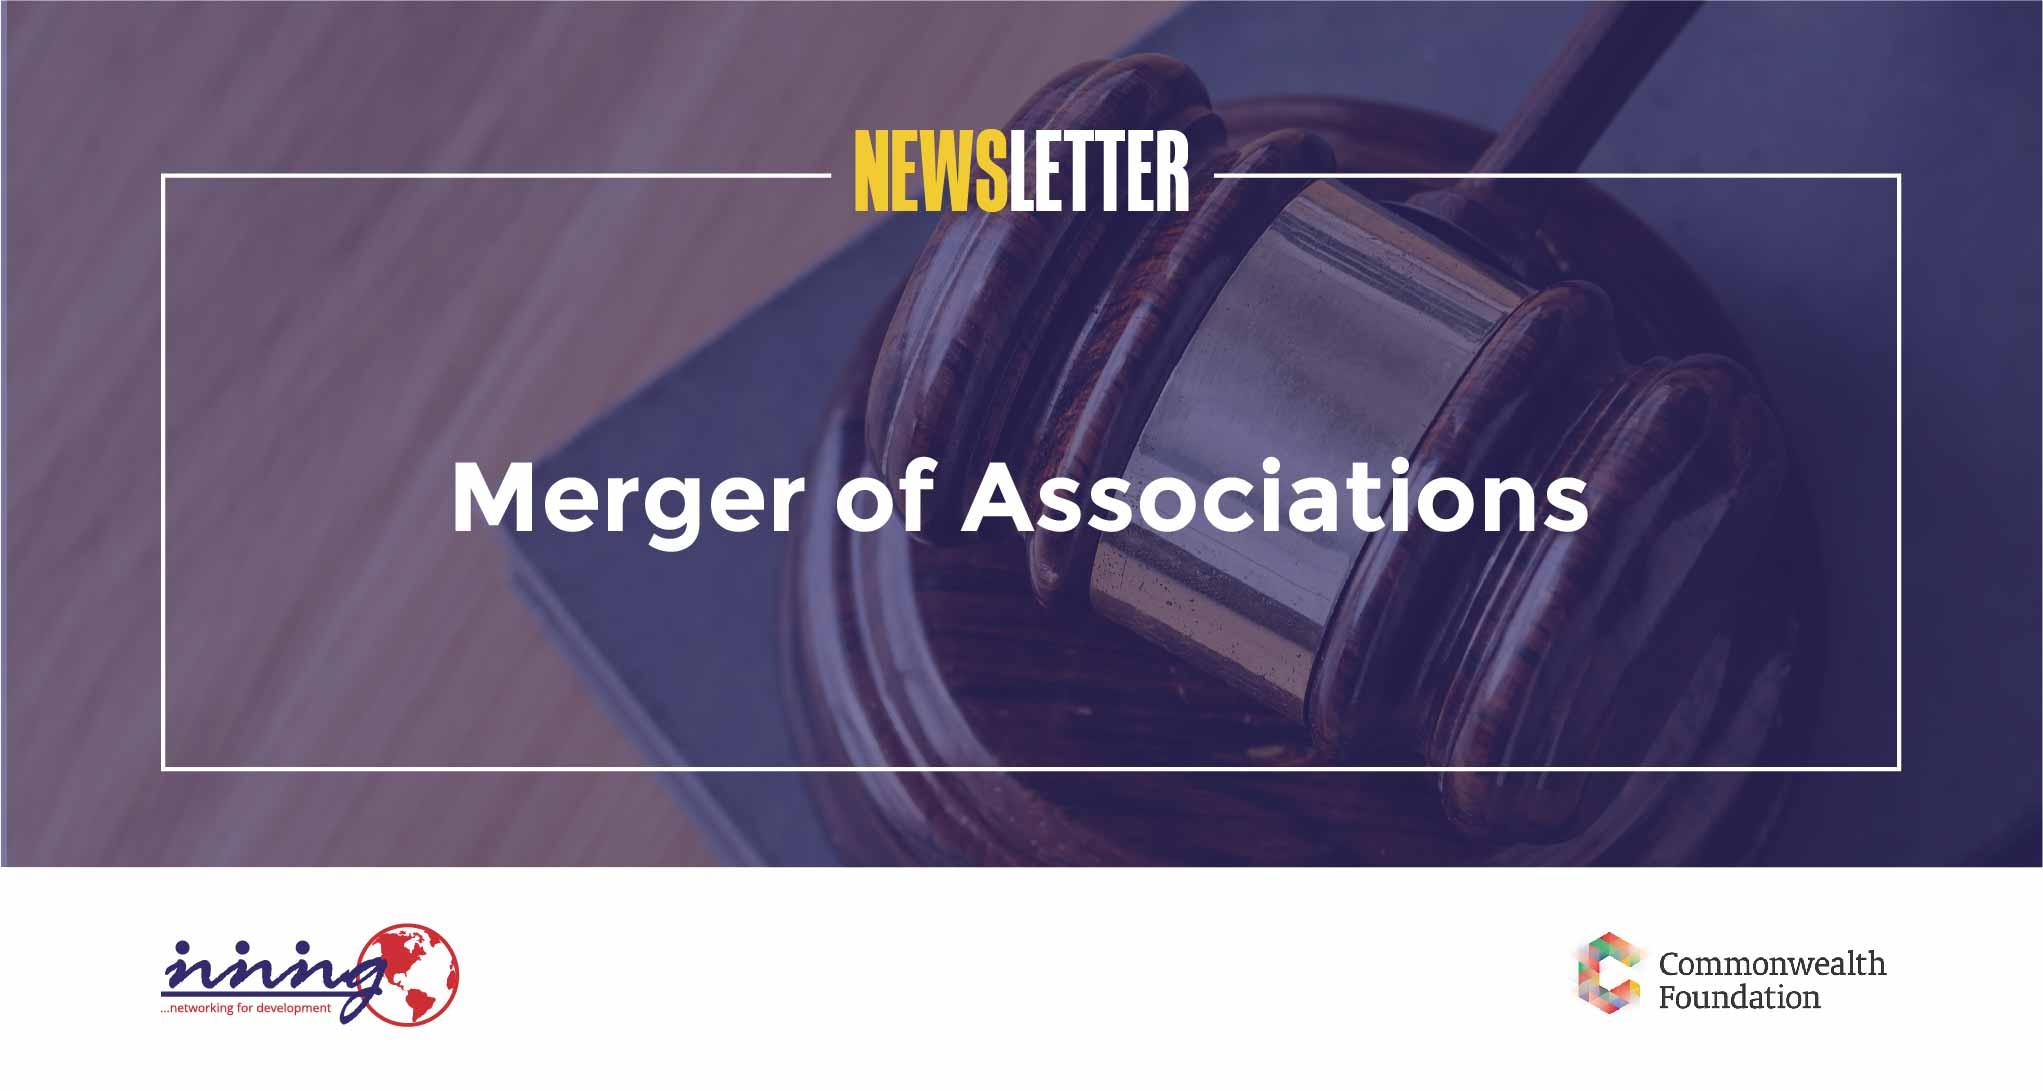 https://campaign-image.com/zohocampaigns/492296000001998033_zc_v10_merger_of_associations.jpg